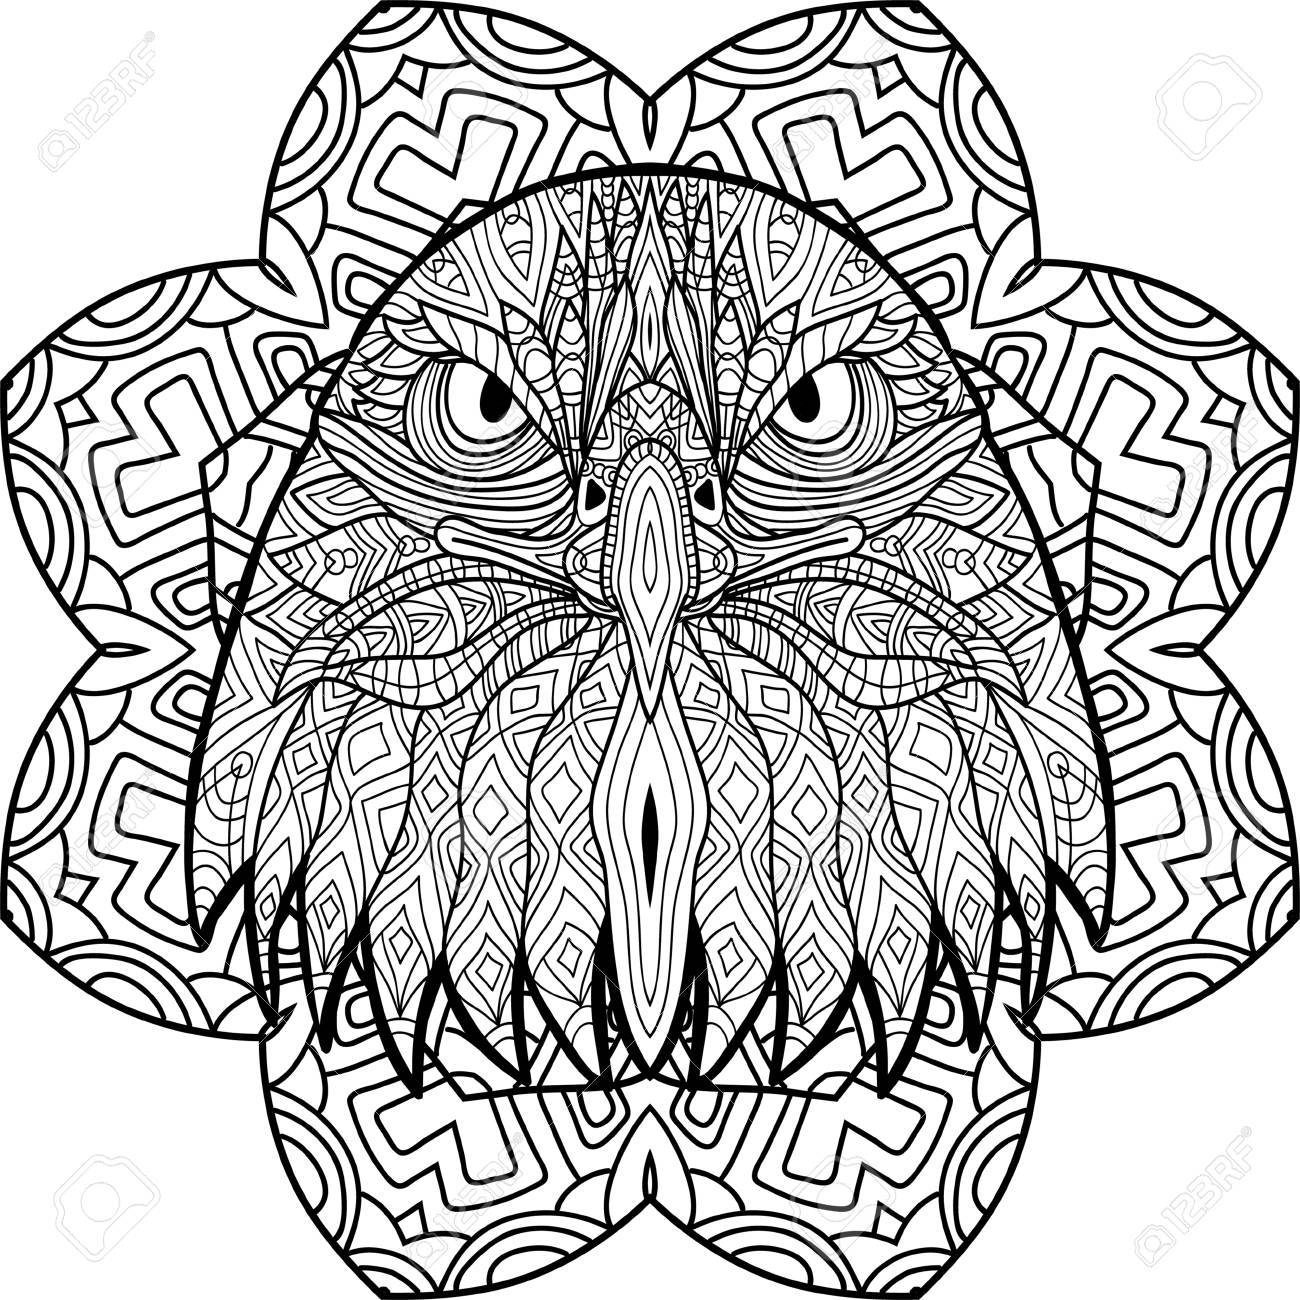 11 Quick Tips Regarding Eagle Mandala Coloring Pages | Mandala ... | 1300x1300